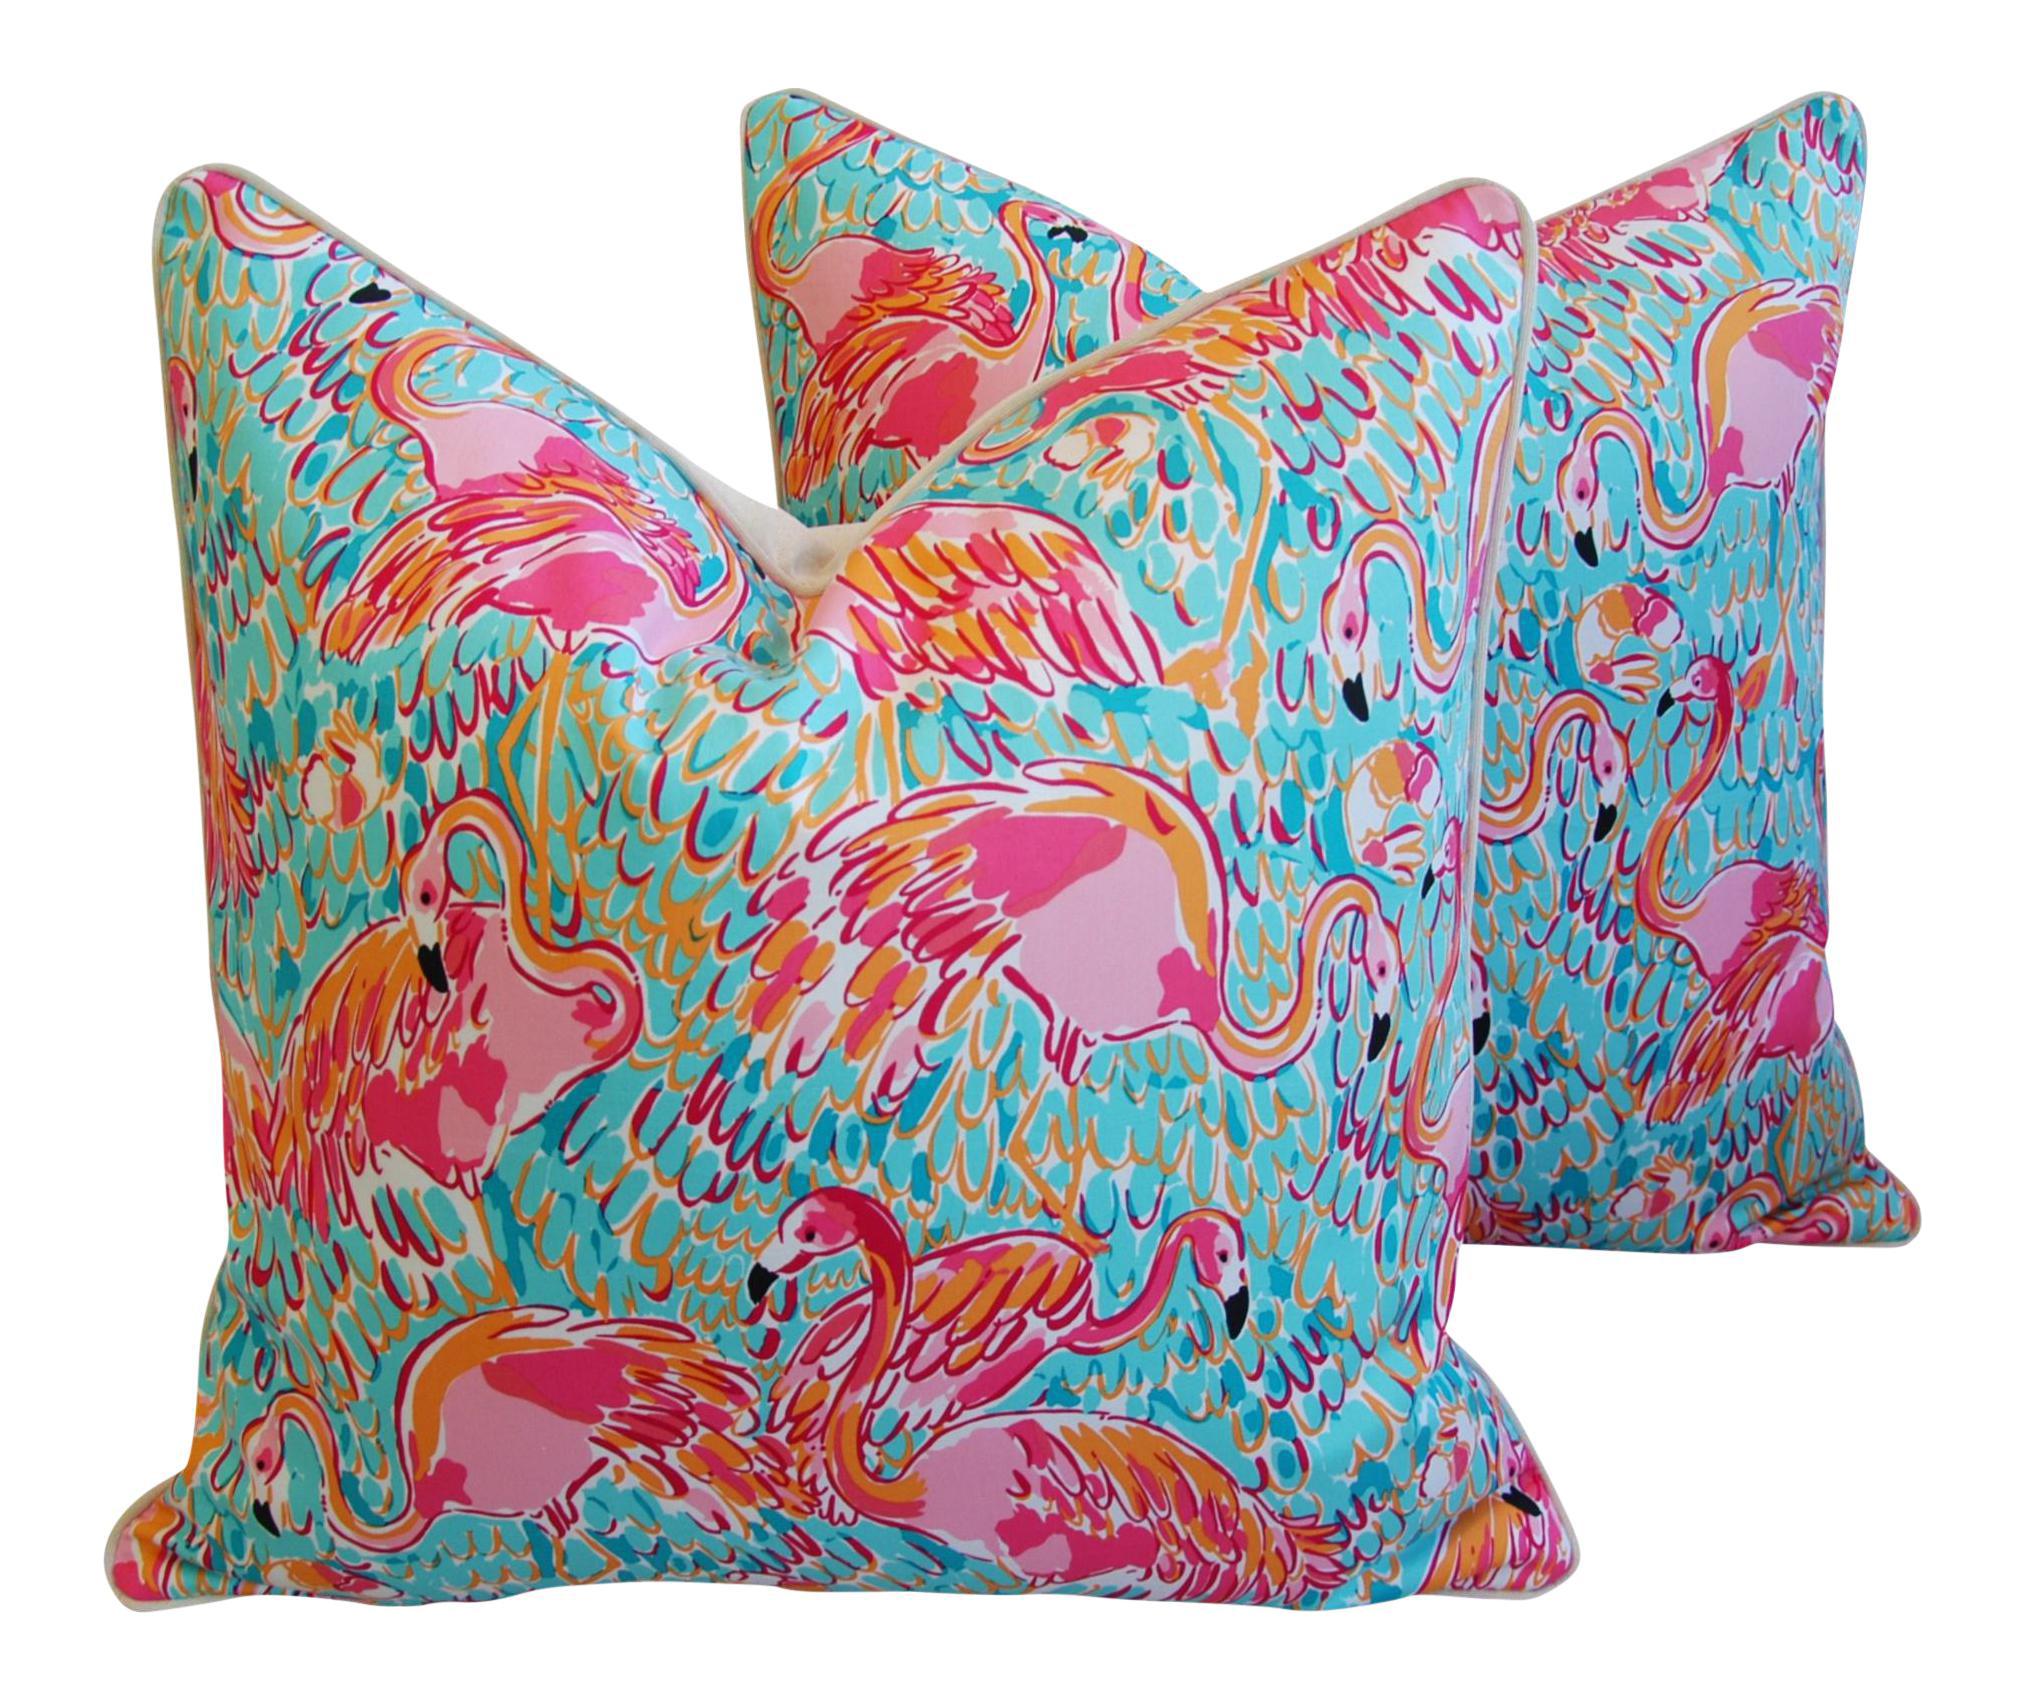 Designer Tropical Pink Flamingo Feather Down Pillows 24